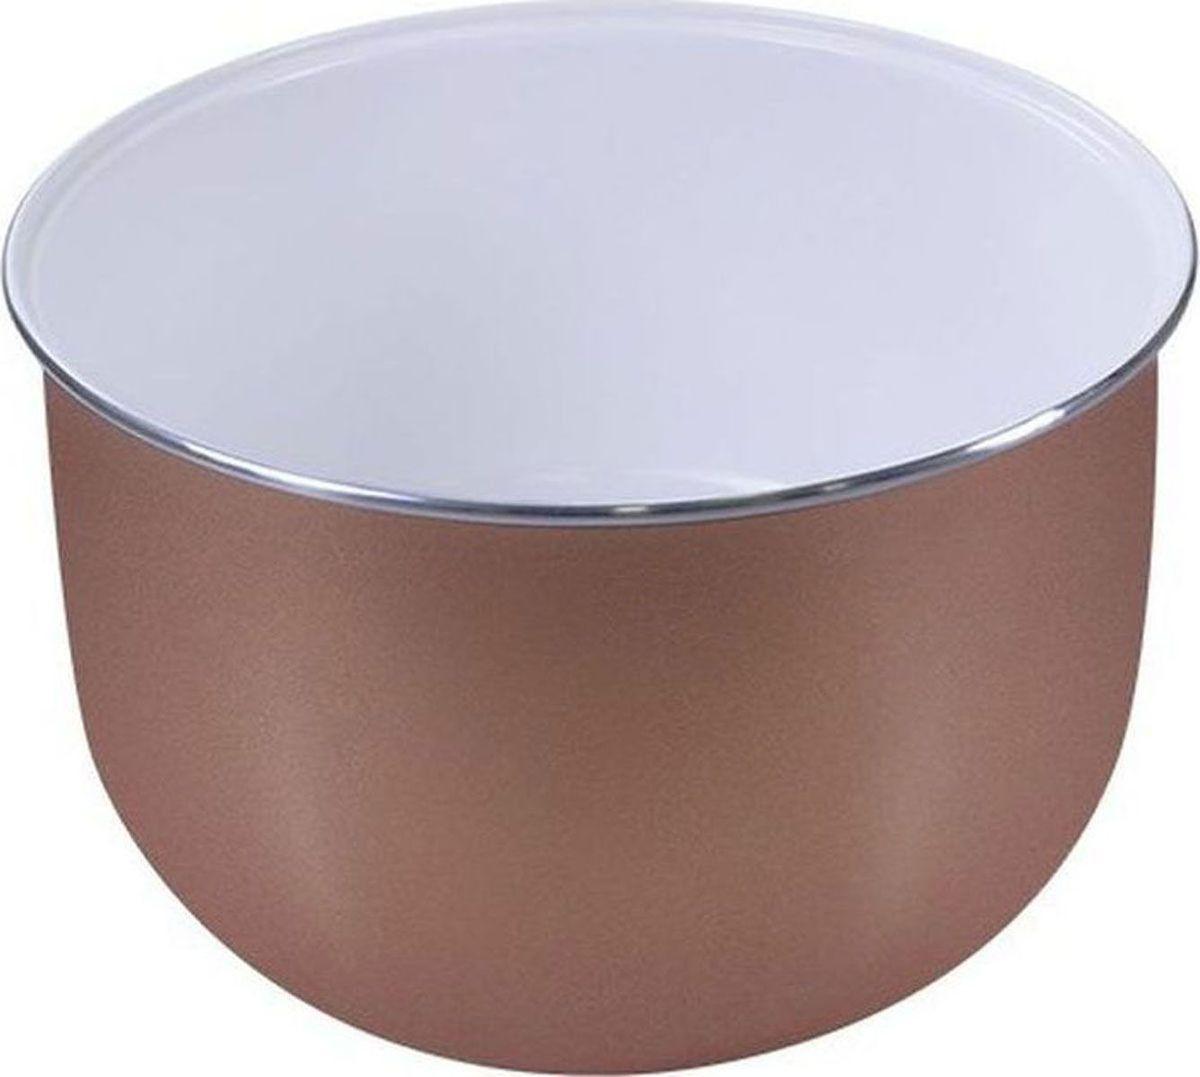 Lumme LU-MC302 Ceramic, White чаша для мультиварки, 3 л lumme lu 1319 silver весы кухонные